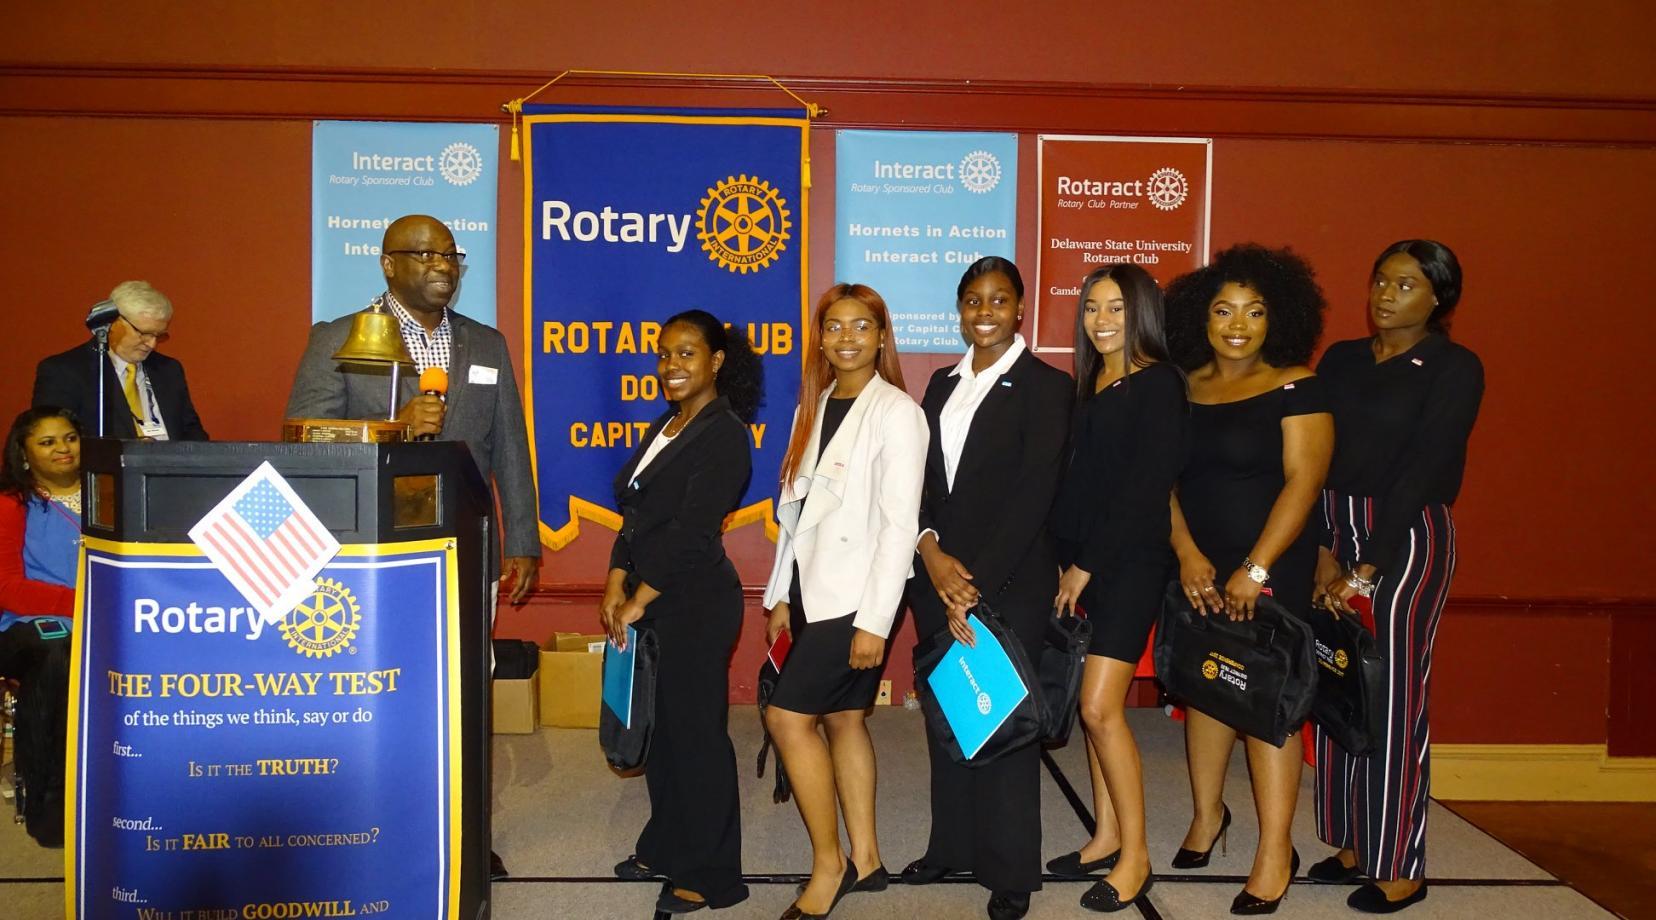 <p>Dr. Esosa Iriowen (r), advisor, introduces the clubs' officers: (l-r) Kasha Hartz (Interact president); Jada Rider (Rotaract president), Francesca Clark (Interact vice pres.), Makila Meyers (Rotaract vice pres.), Sarah Saintaile (Rotaract secretary), and Aanyah Bailey (Rotaract treasurer).</p>